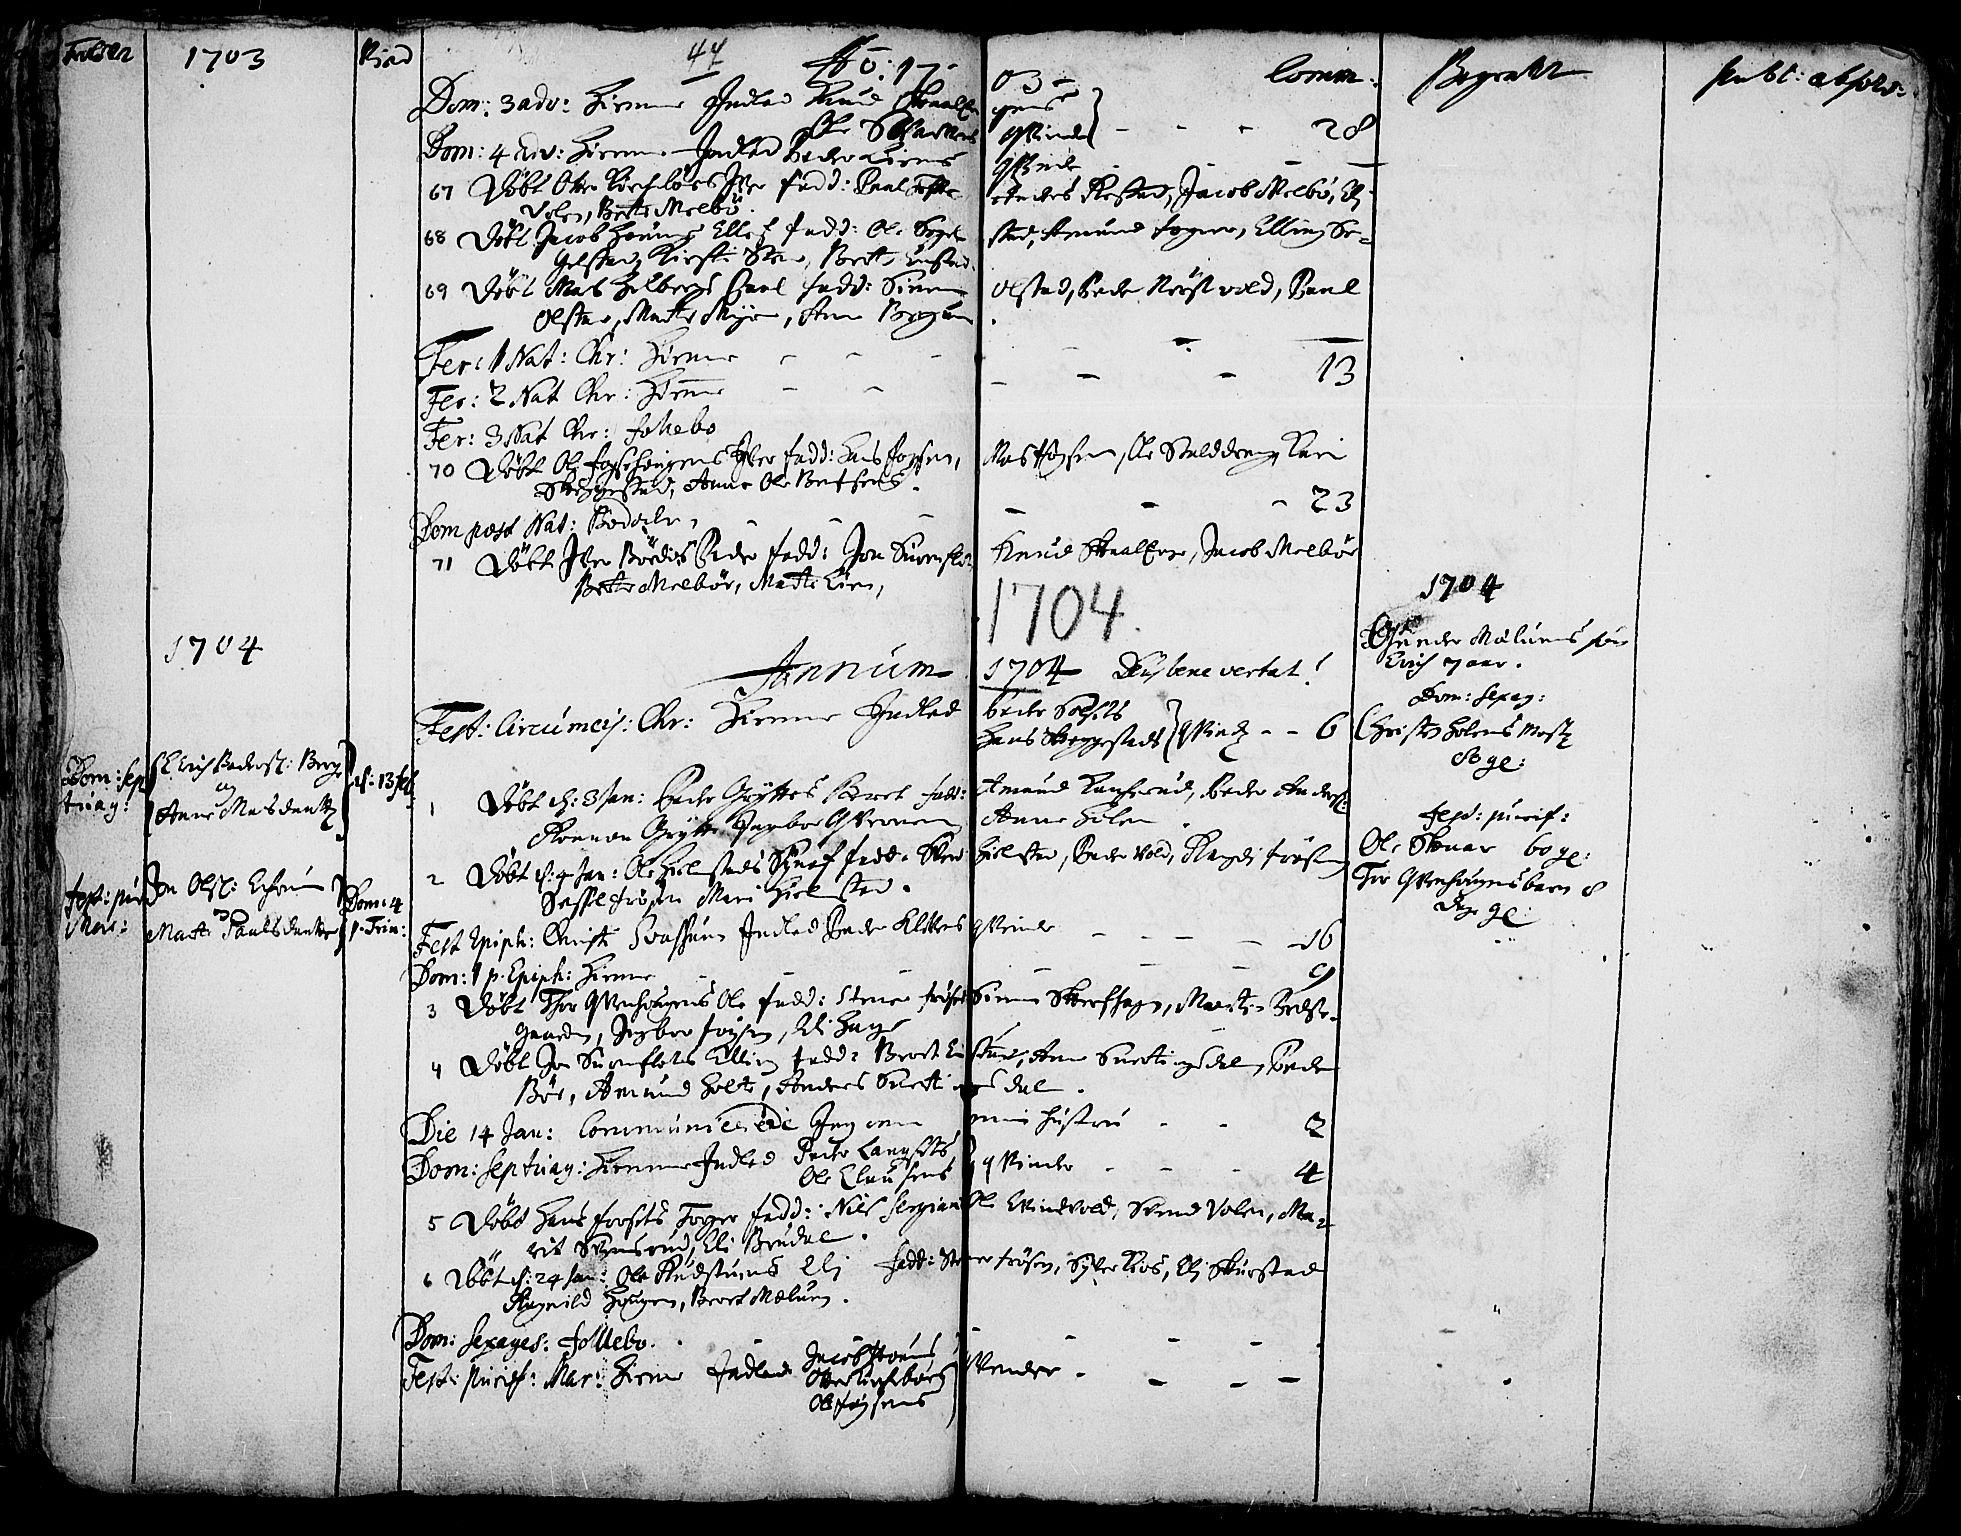 SAH, Gausdal prestekontor, Ministerialbok nr. 1, 1693-1728, s. 47